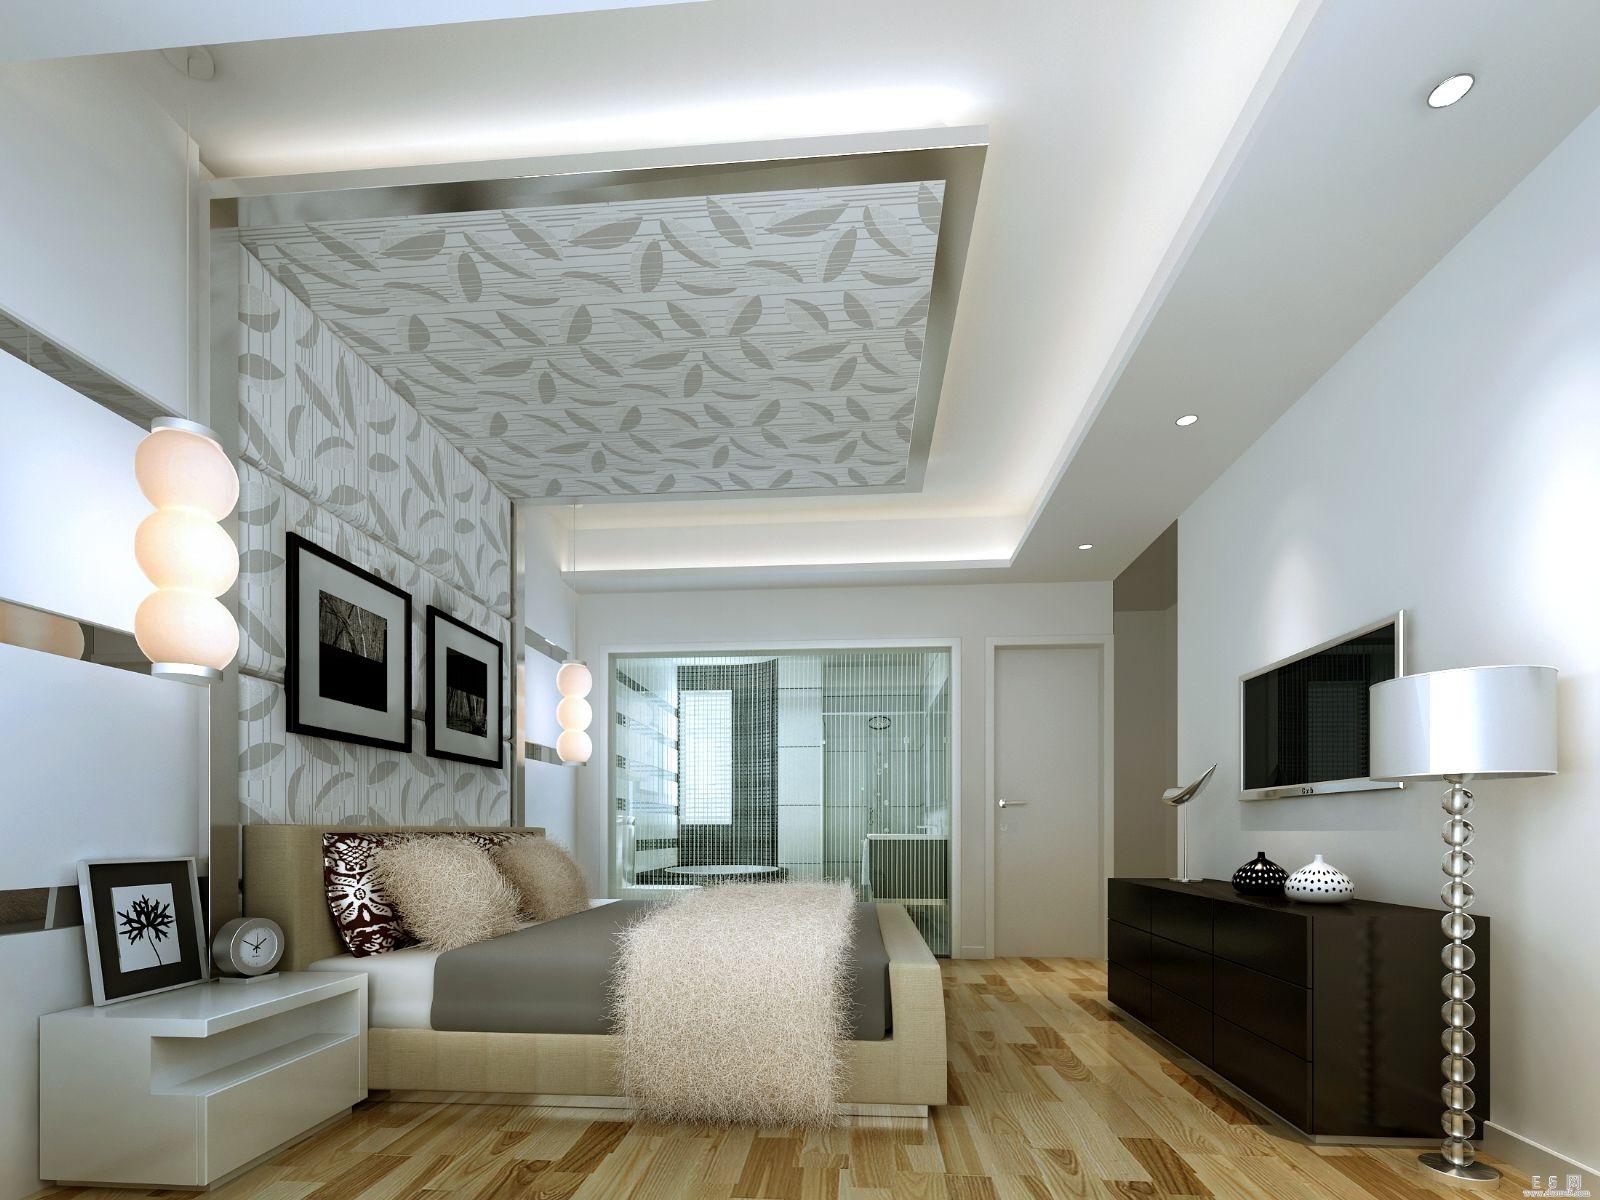 Потолок гипсокартон фото спальня